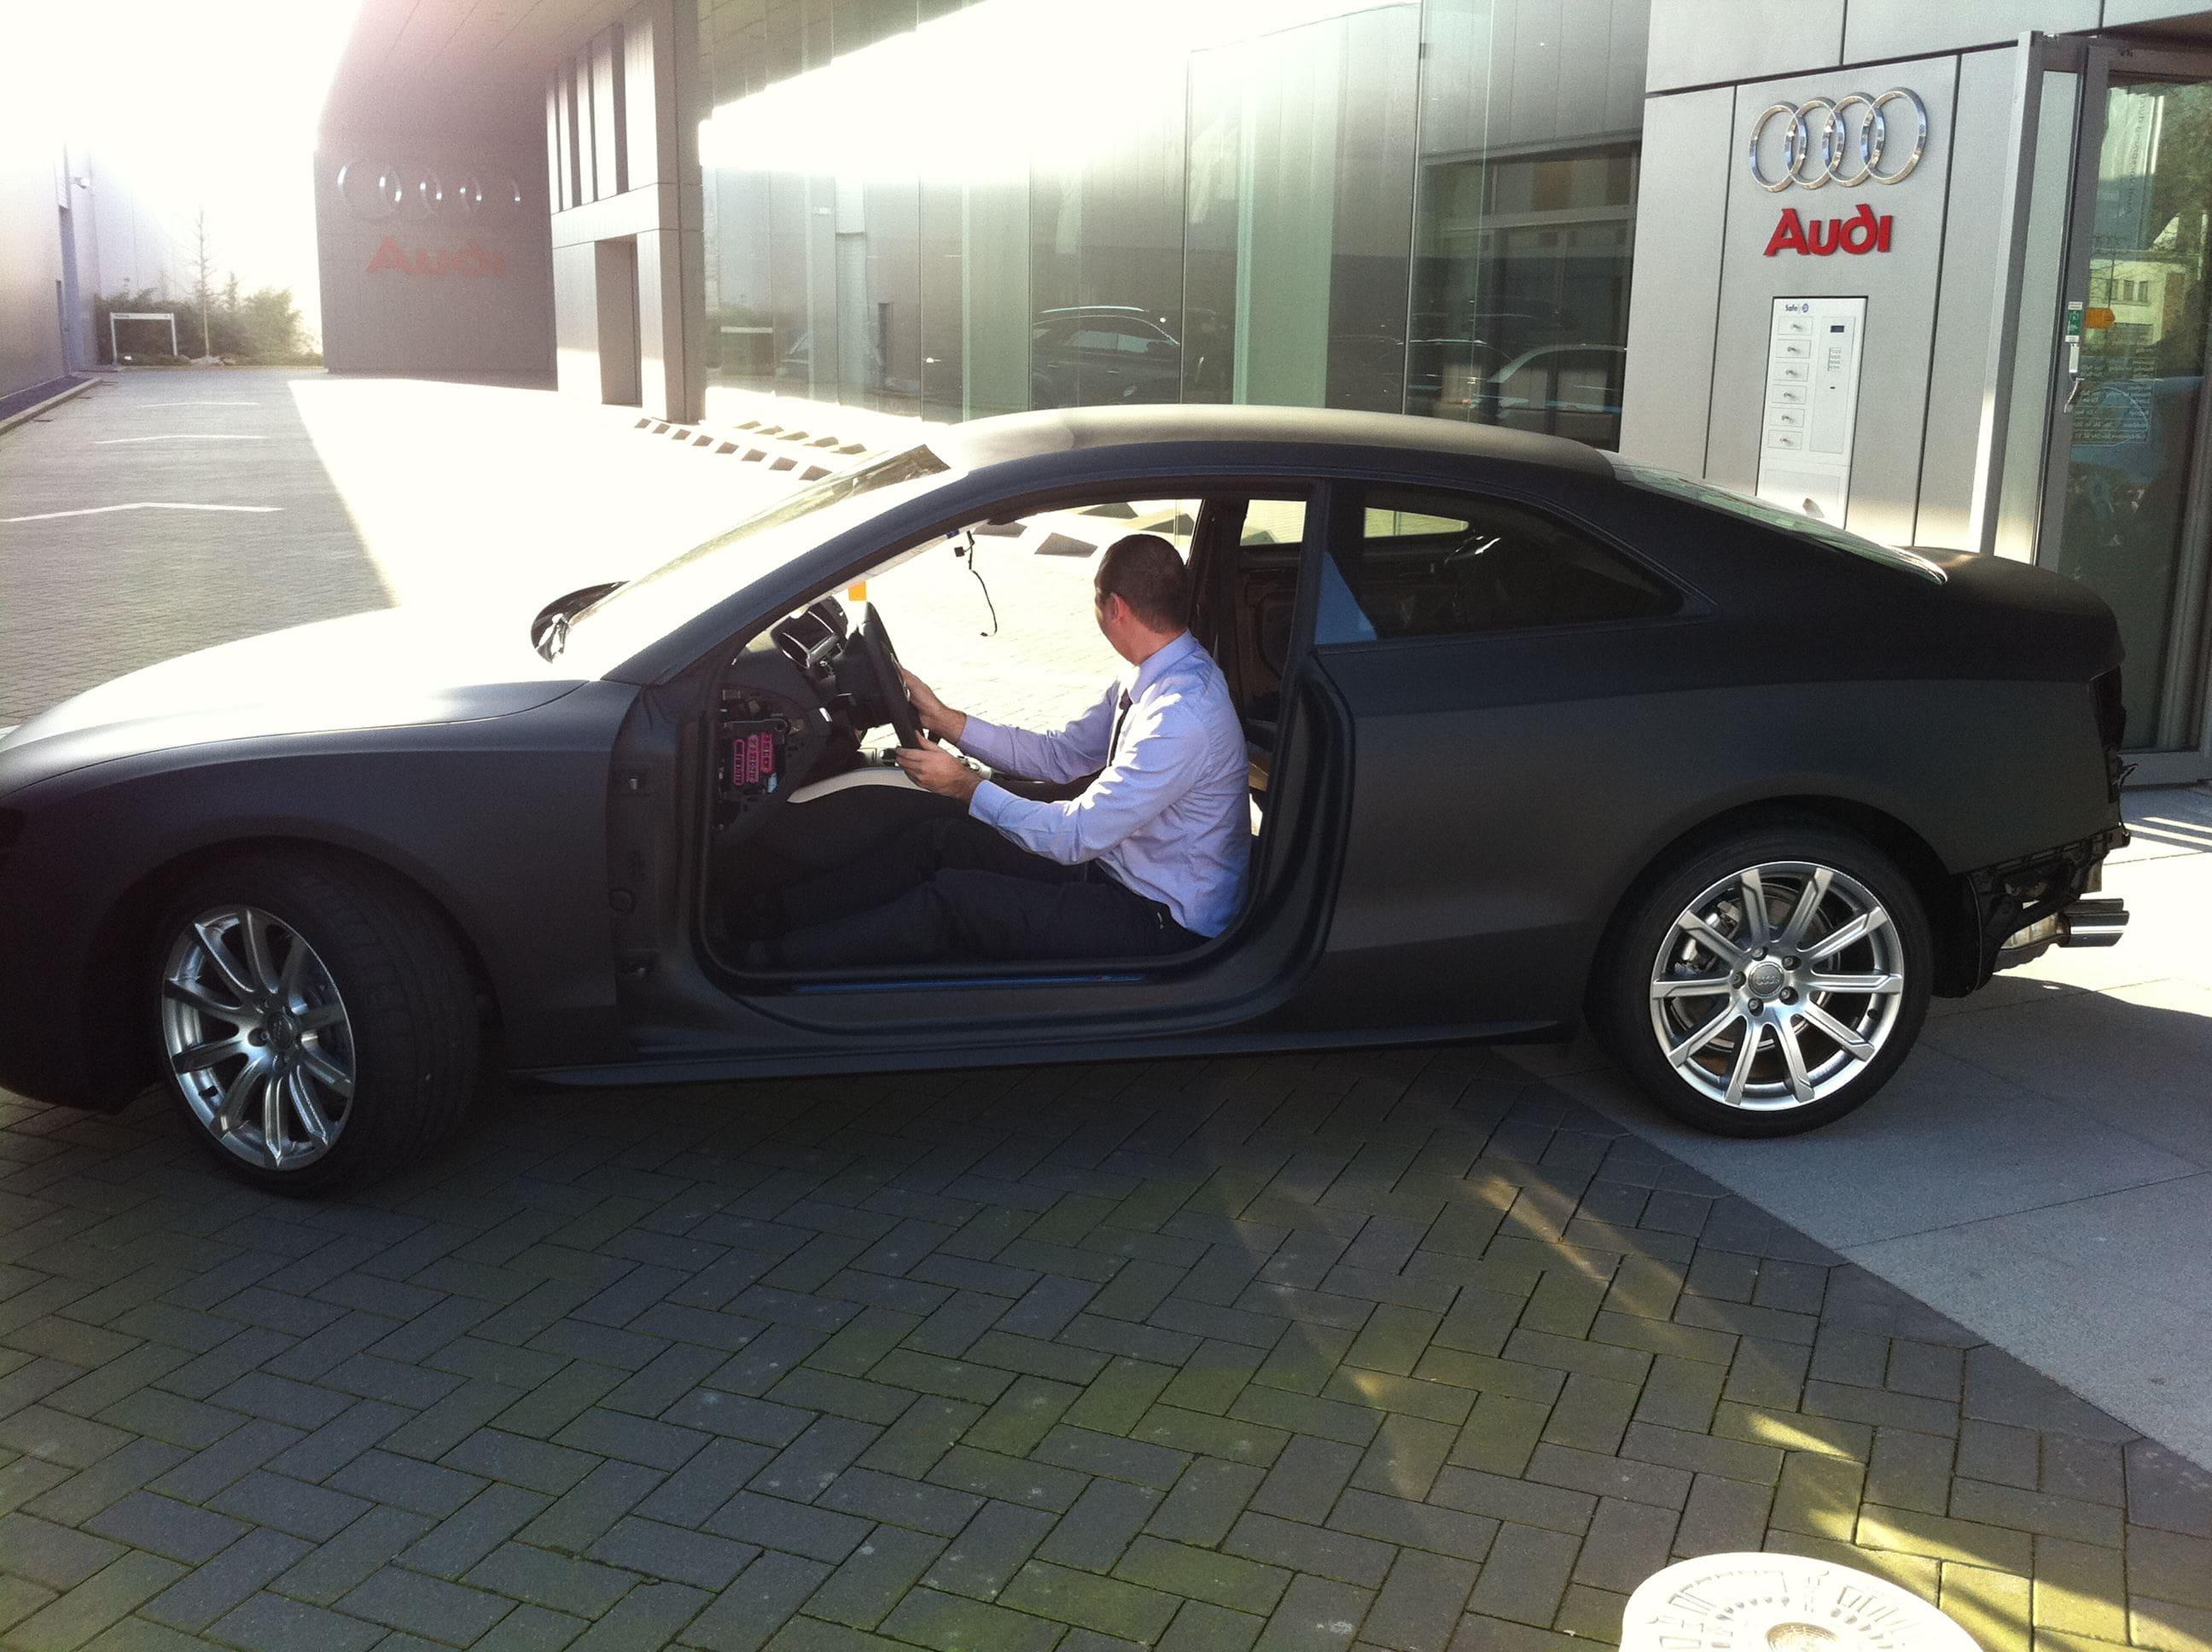 Audi A5 Coupe met Mat Zwarte Wrap, Carwrapping door Wrapmyride.nu Foto-nr:4588, ©2021